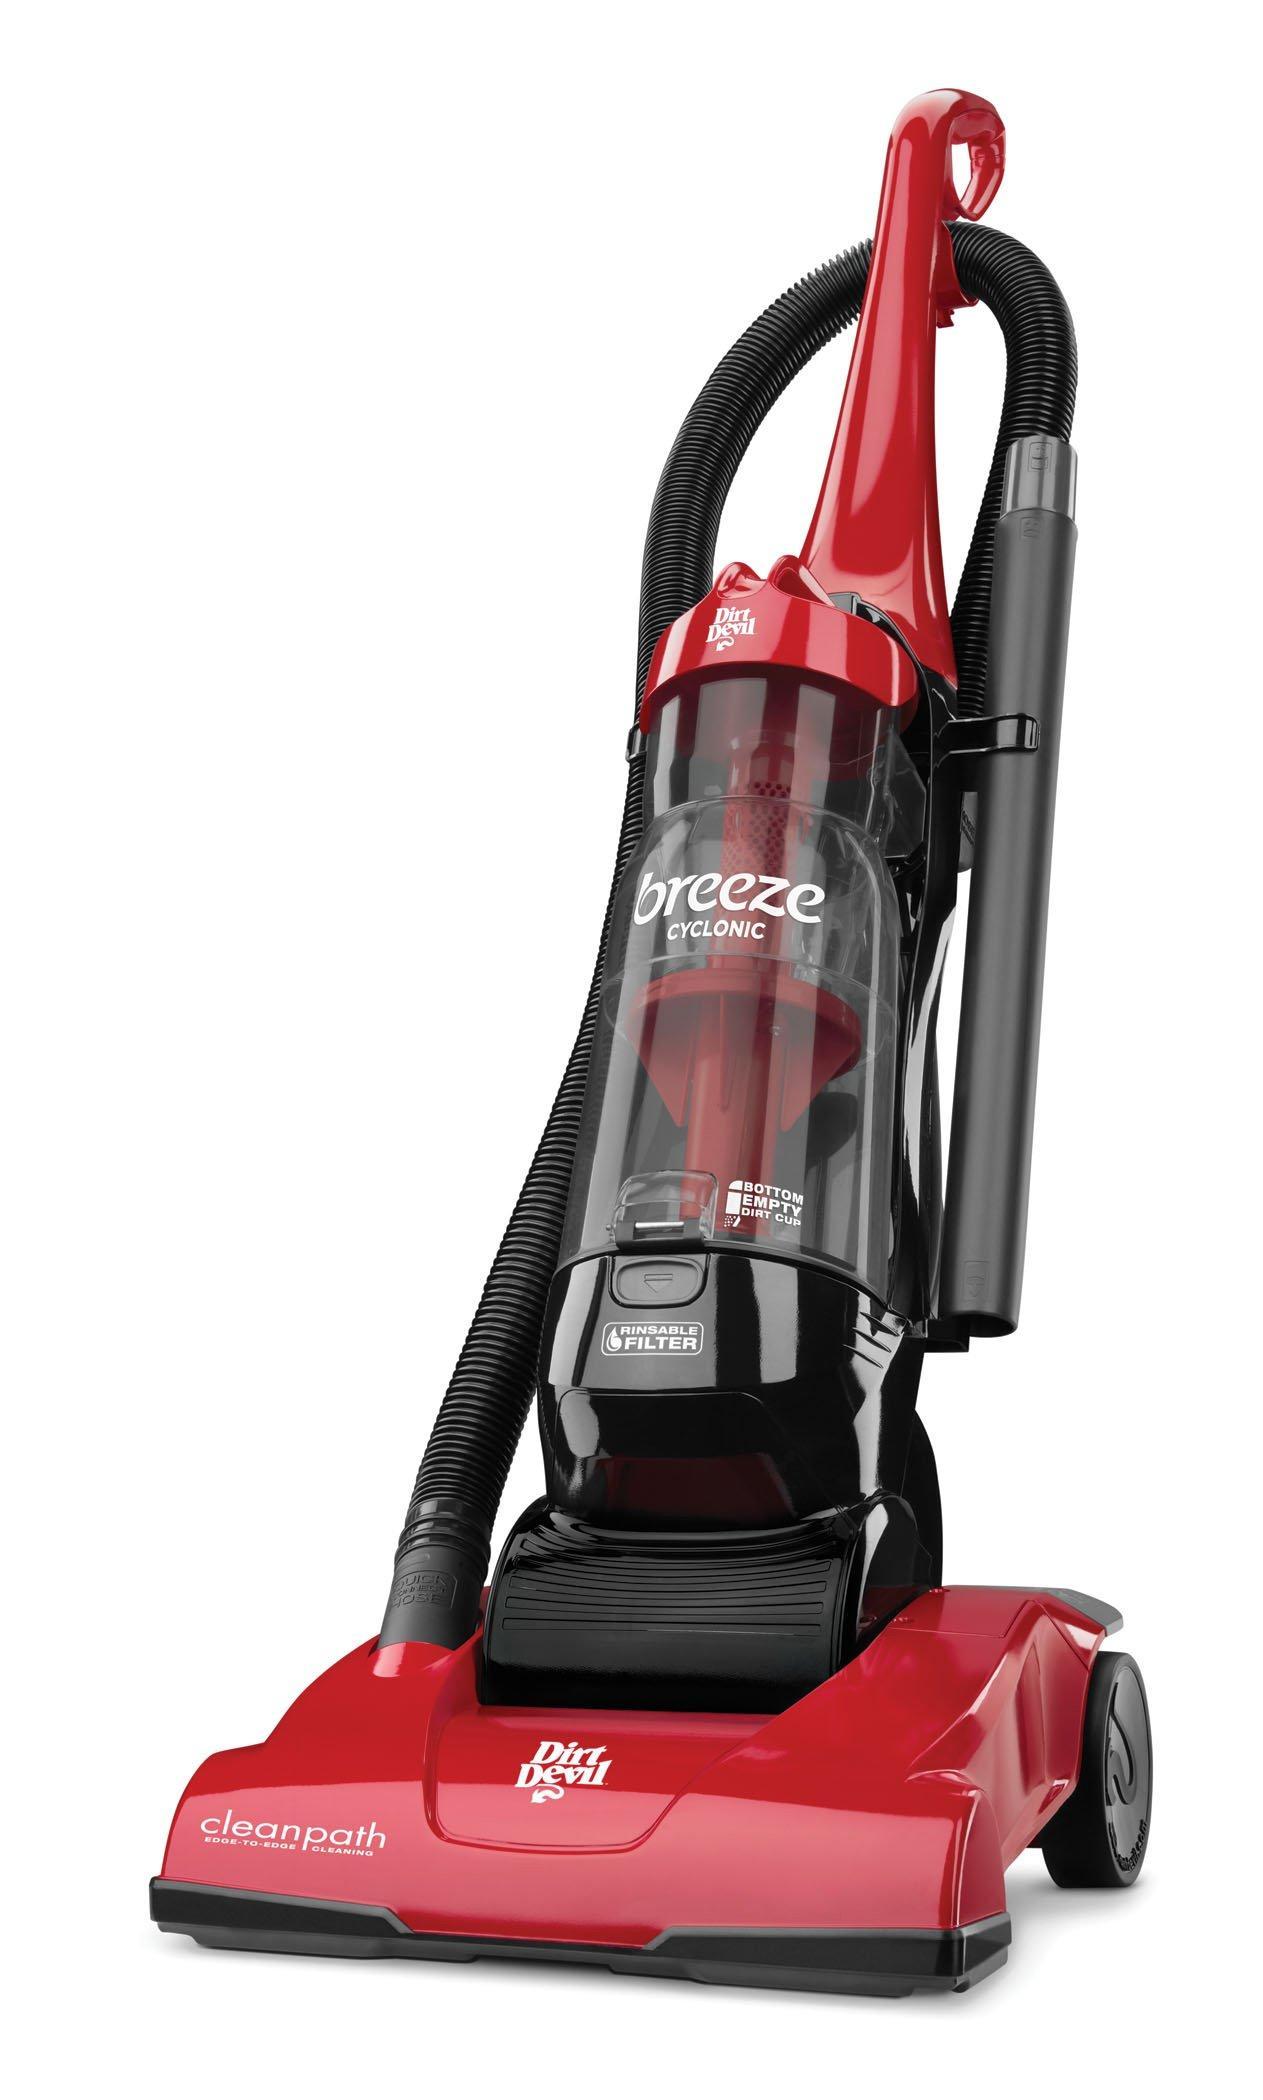 Breeze Cyclonic Upright Vacuum2